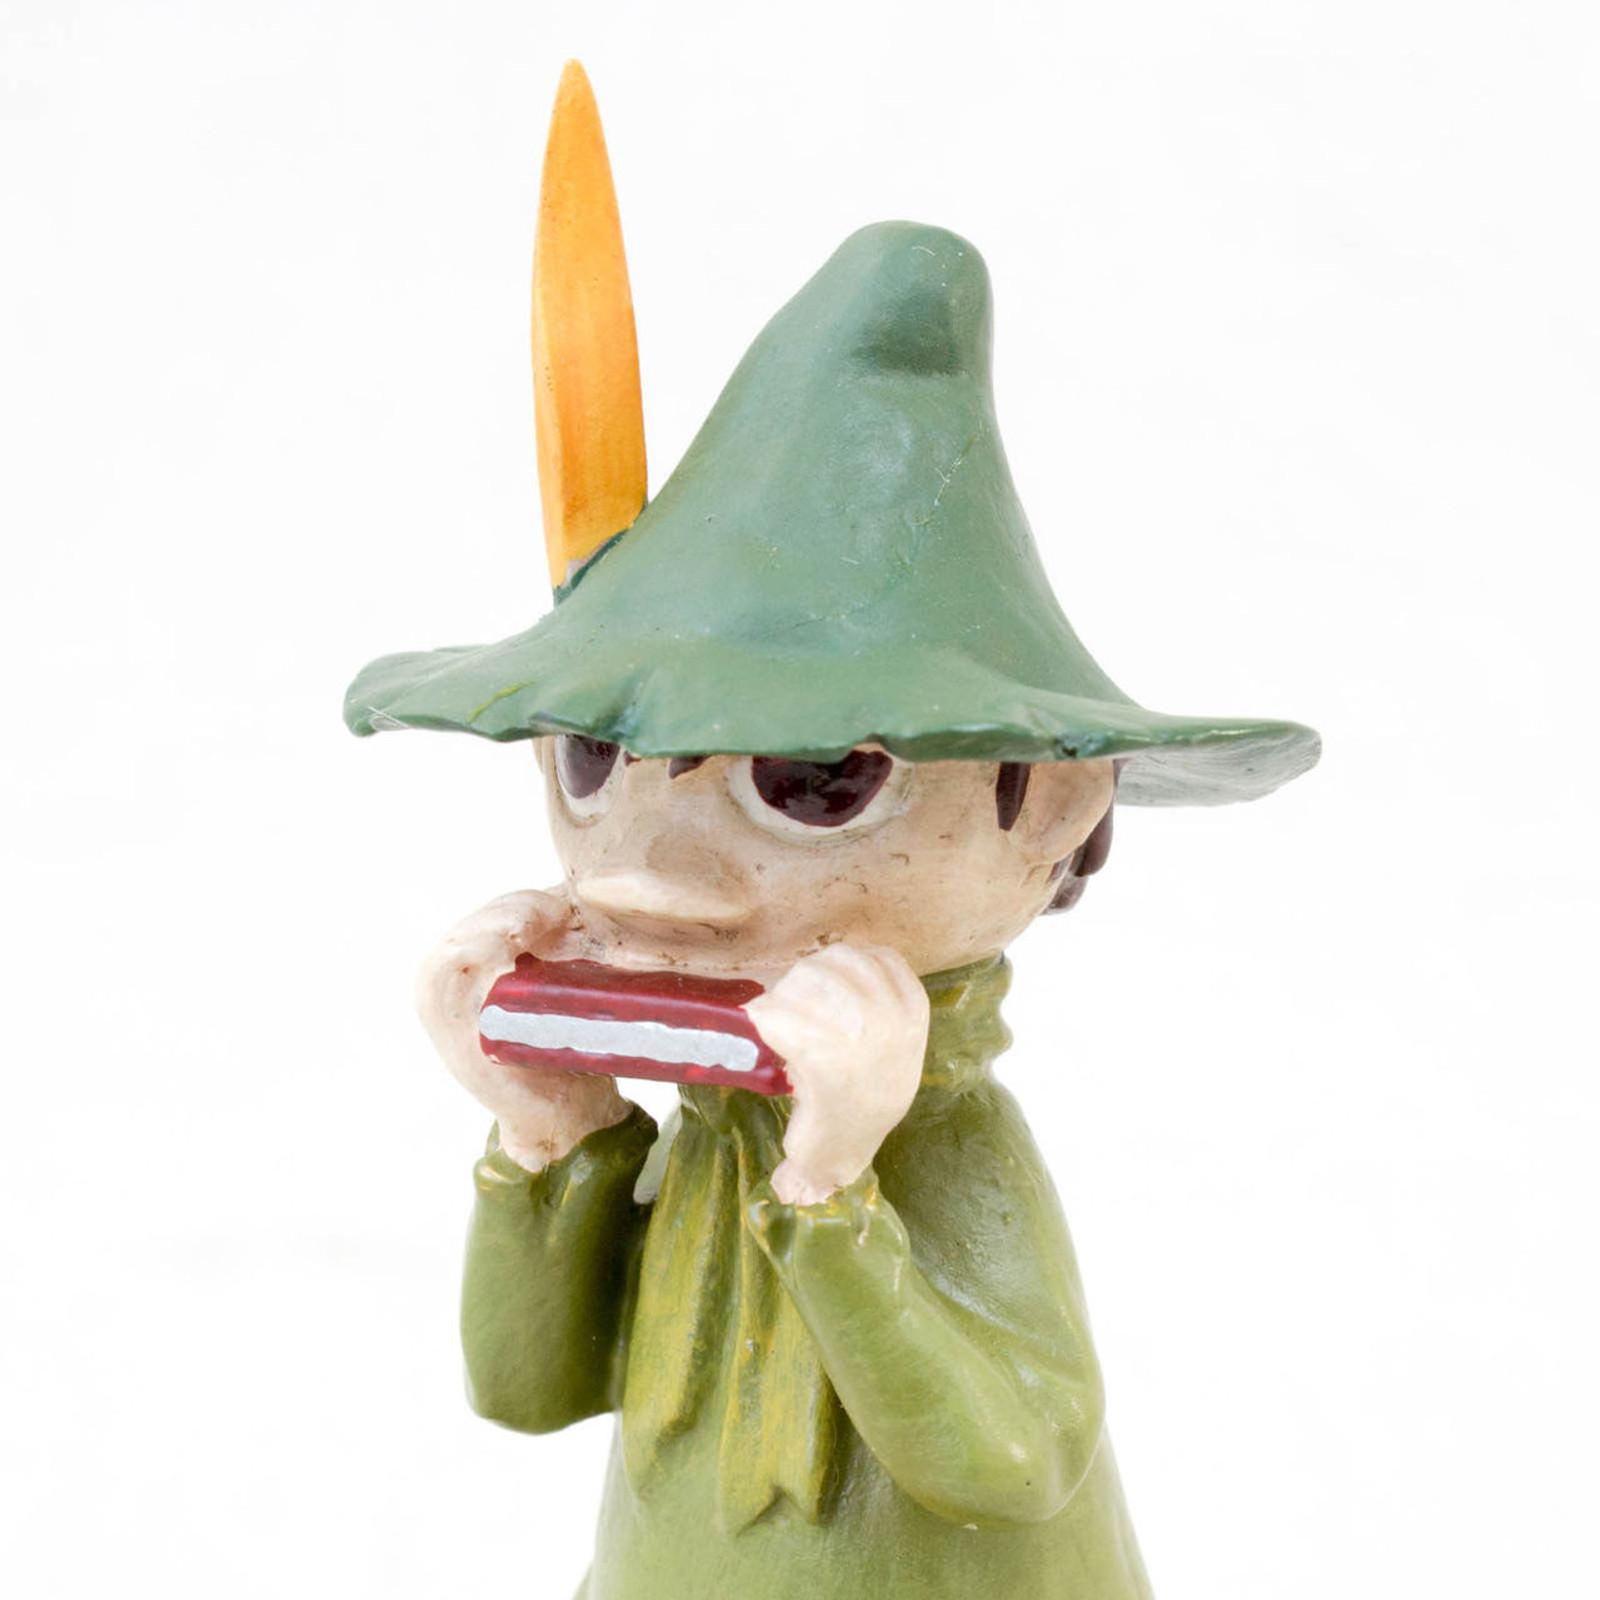 RARE! Moomin Characters Snufkin Original Comics Ver. Mini Figure Benelic 2